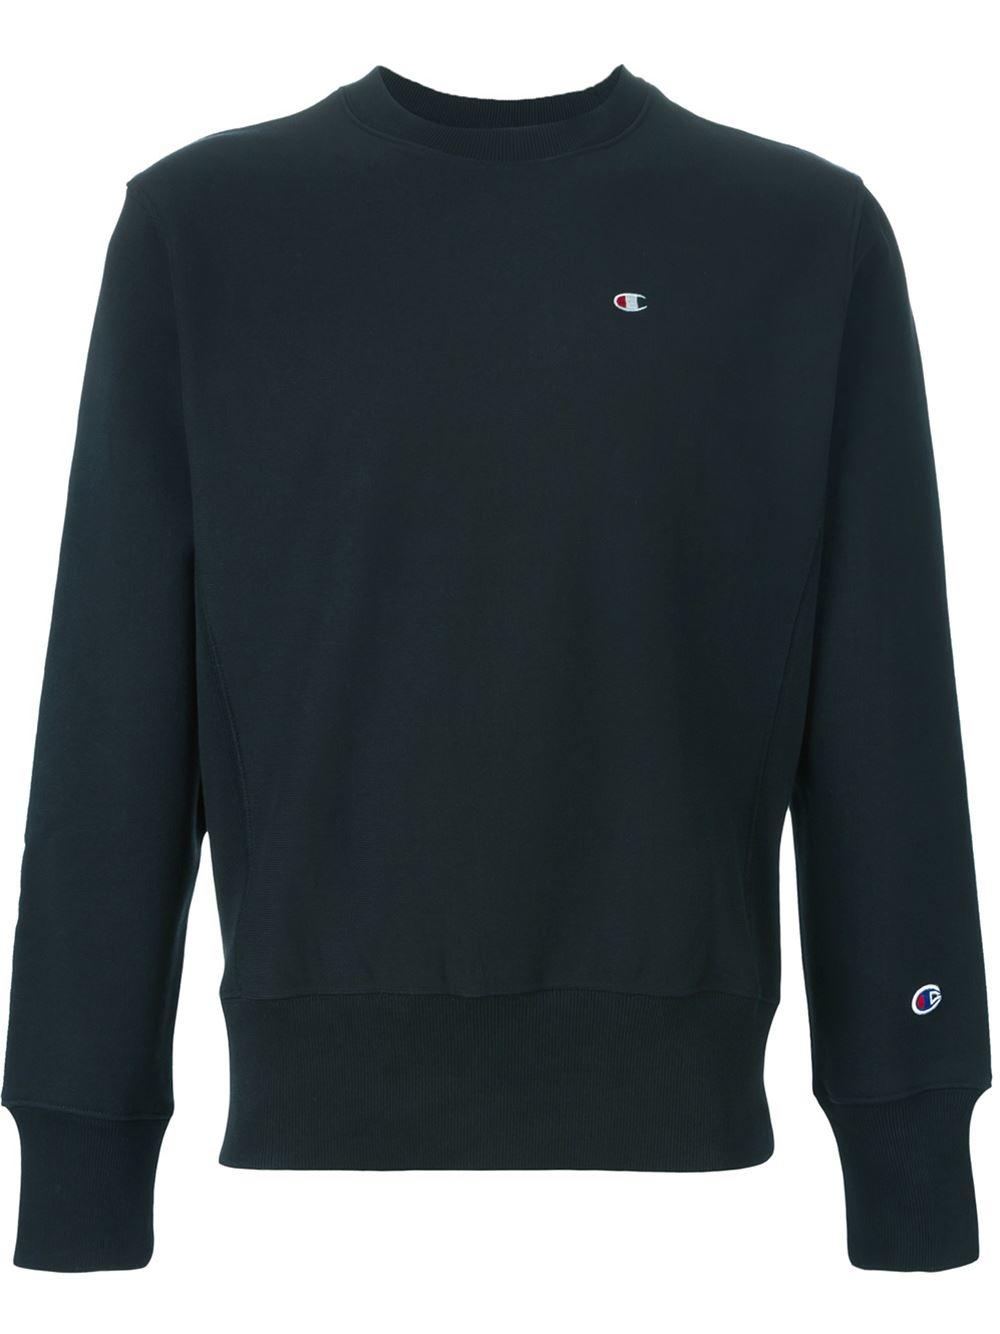 Champion Crew Neck Sweatshirt In Black For Men Lyst